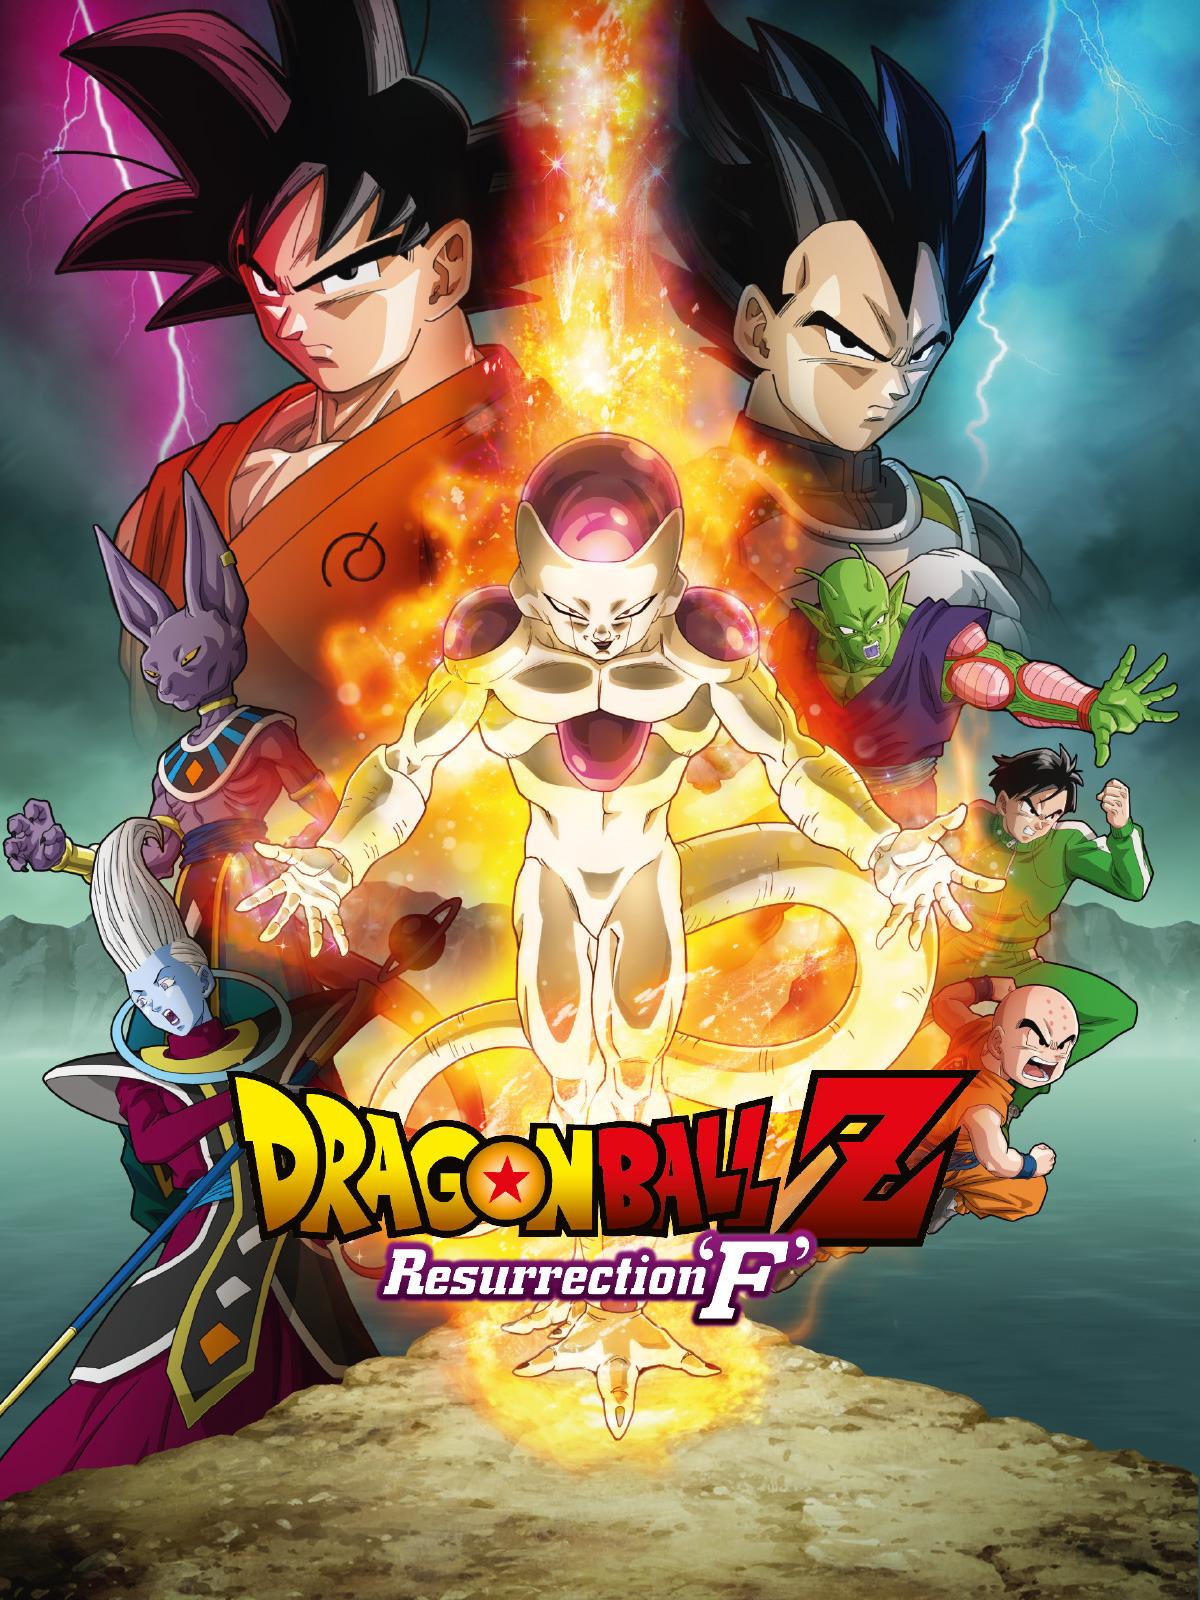 Dragonball Z 15: Resurrection 'F'